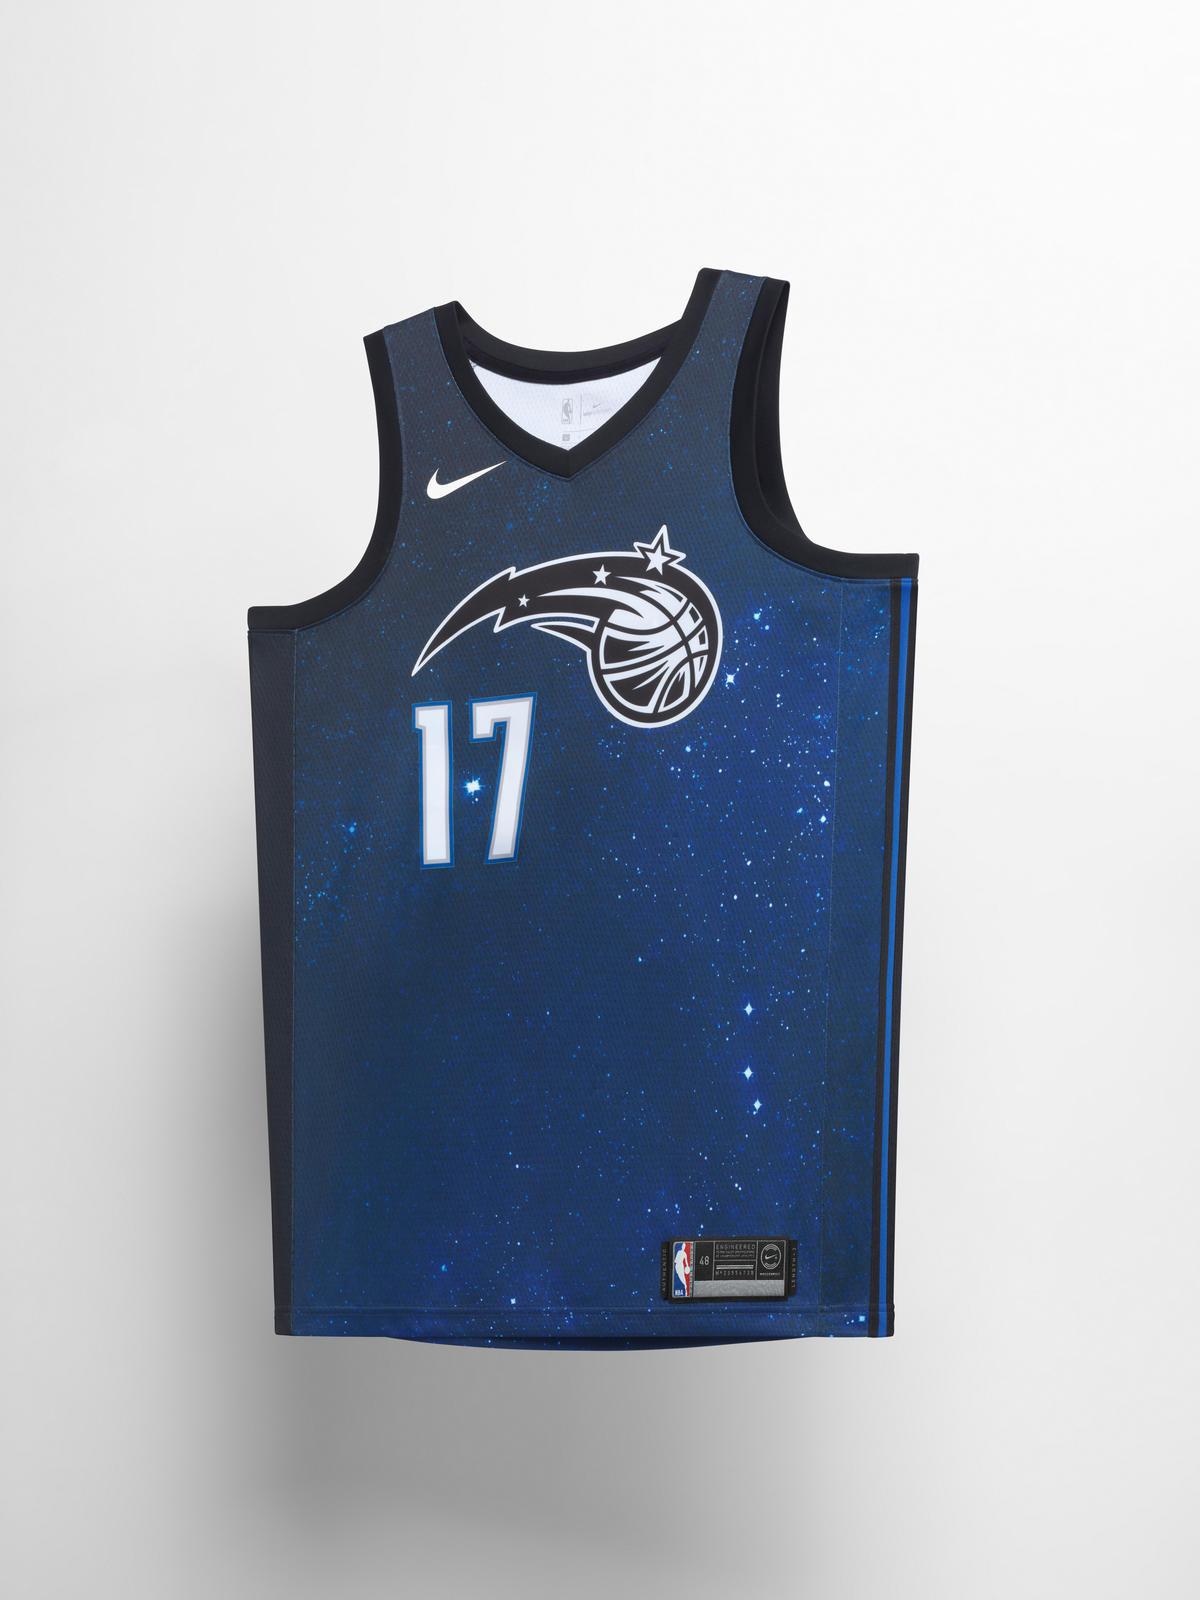 Nike_NBA_City_Edition_Uniform_Orlando_Magic_0137_native_1600